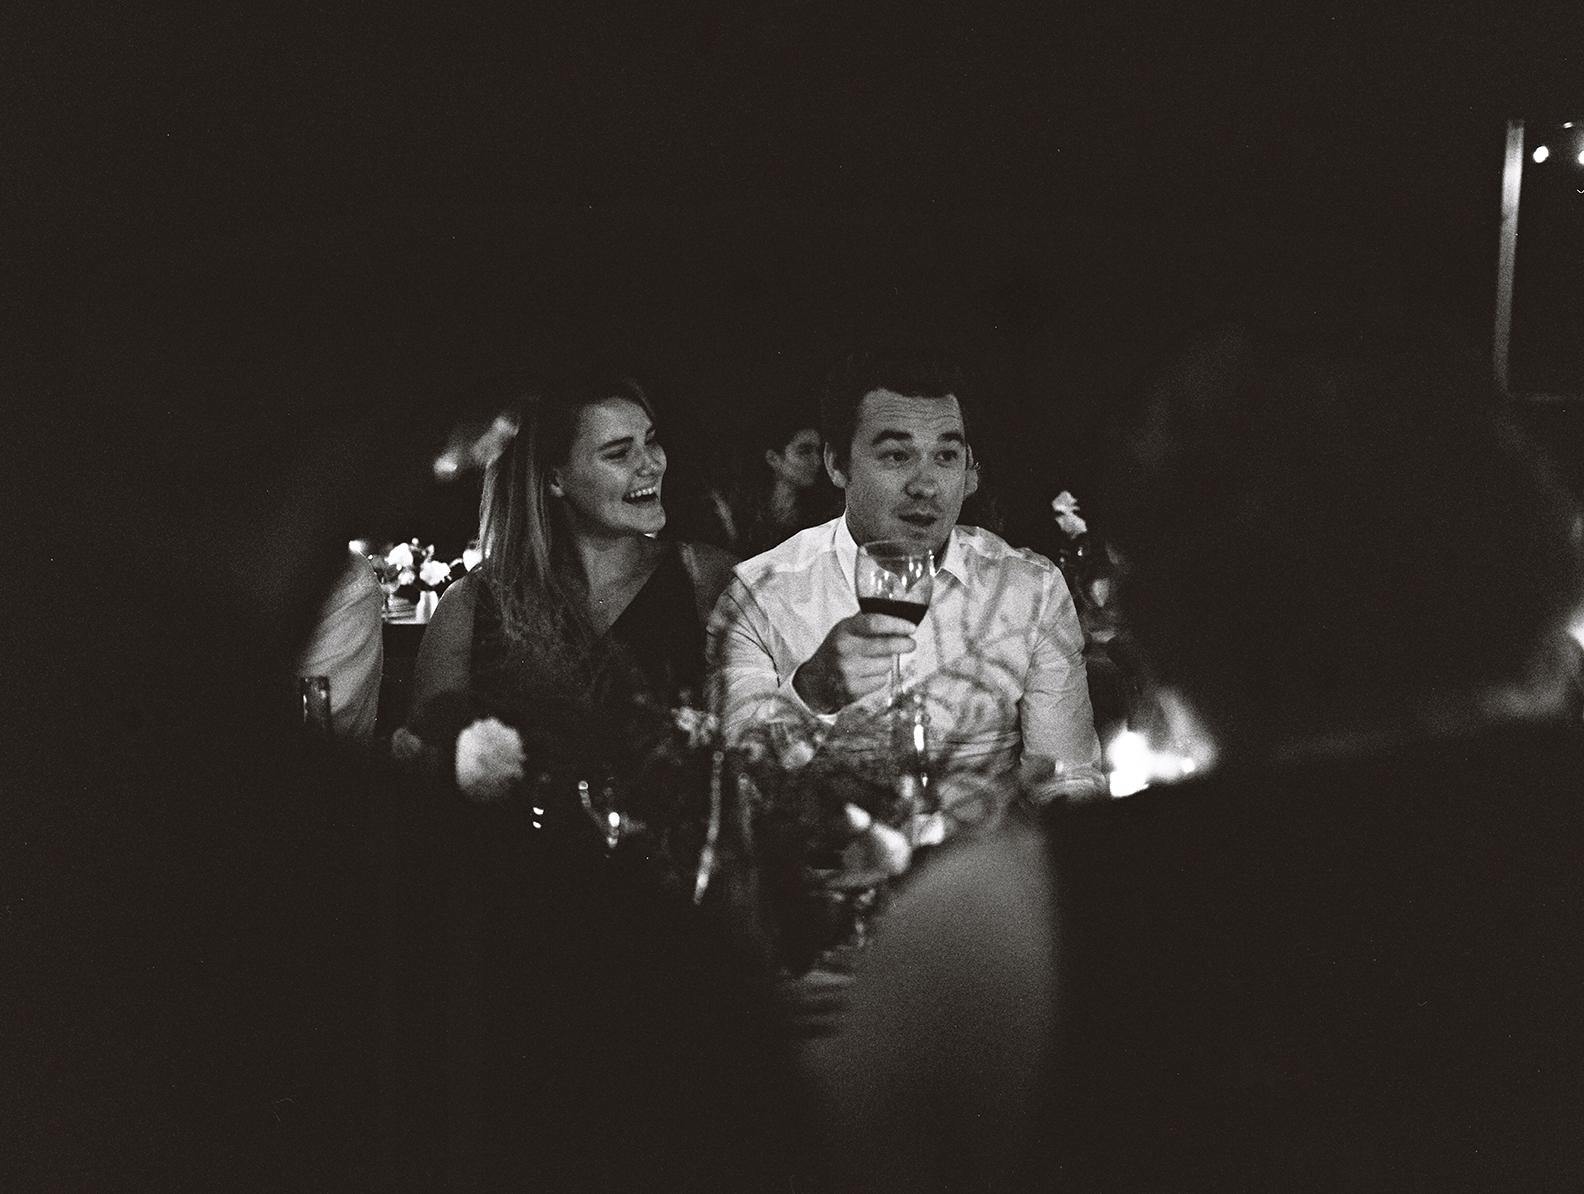 342-brian-sarra-los-angeles-wedding-brumley-wells-photography.jpg